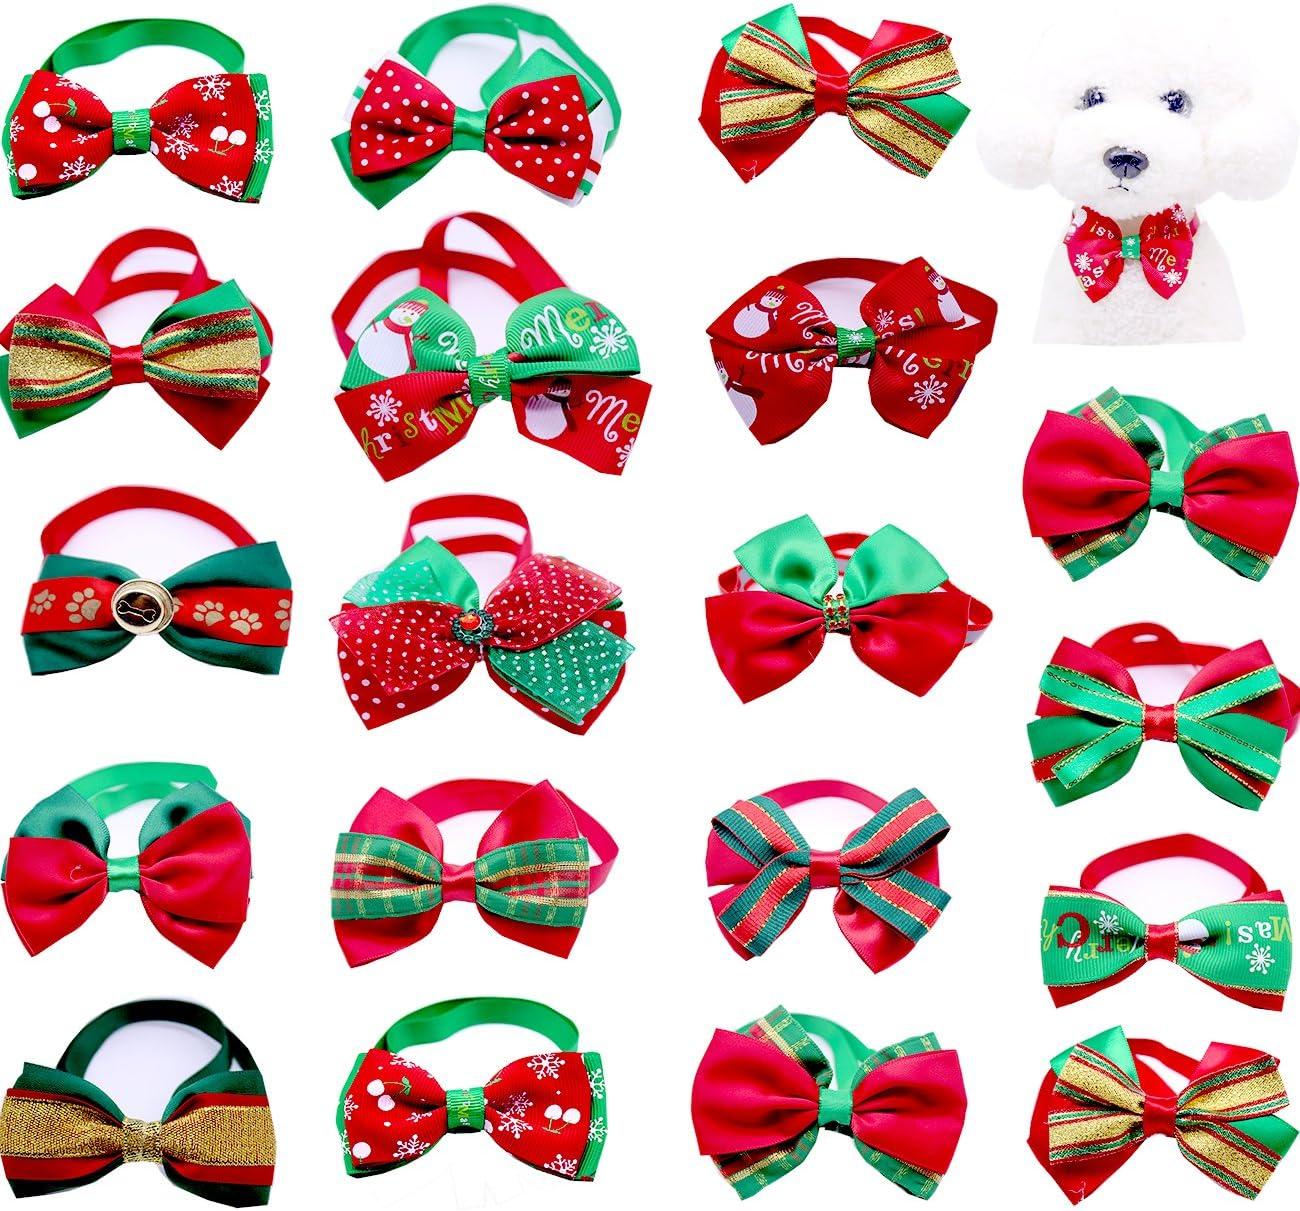 Bargain yagopet 20pcs Christmas Small Dog Ties Colla Bowties shopping Bow Cat